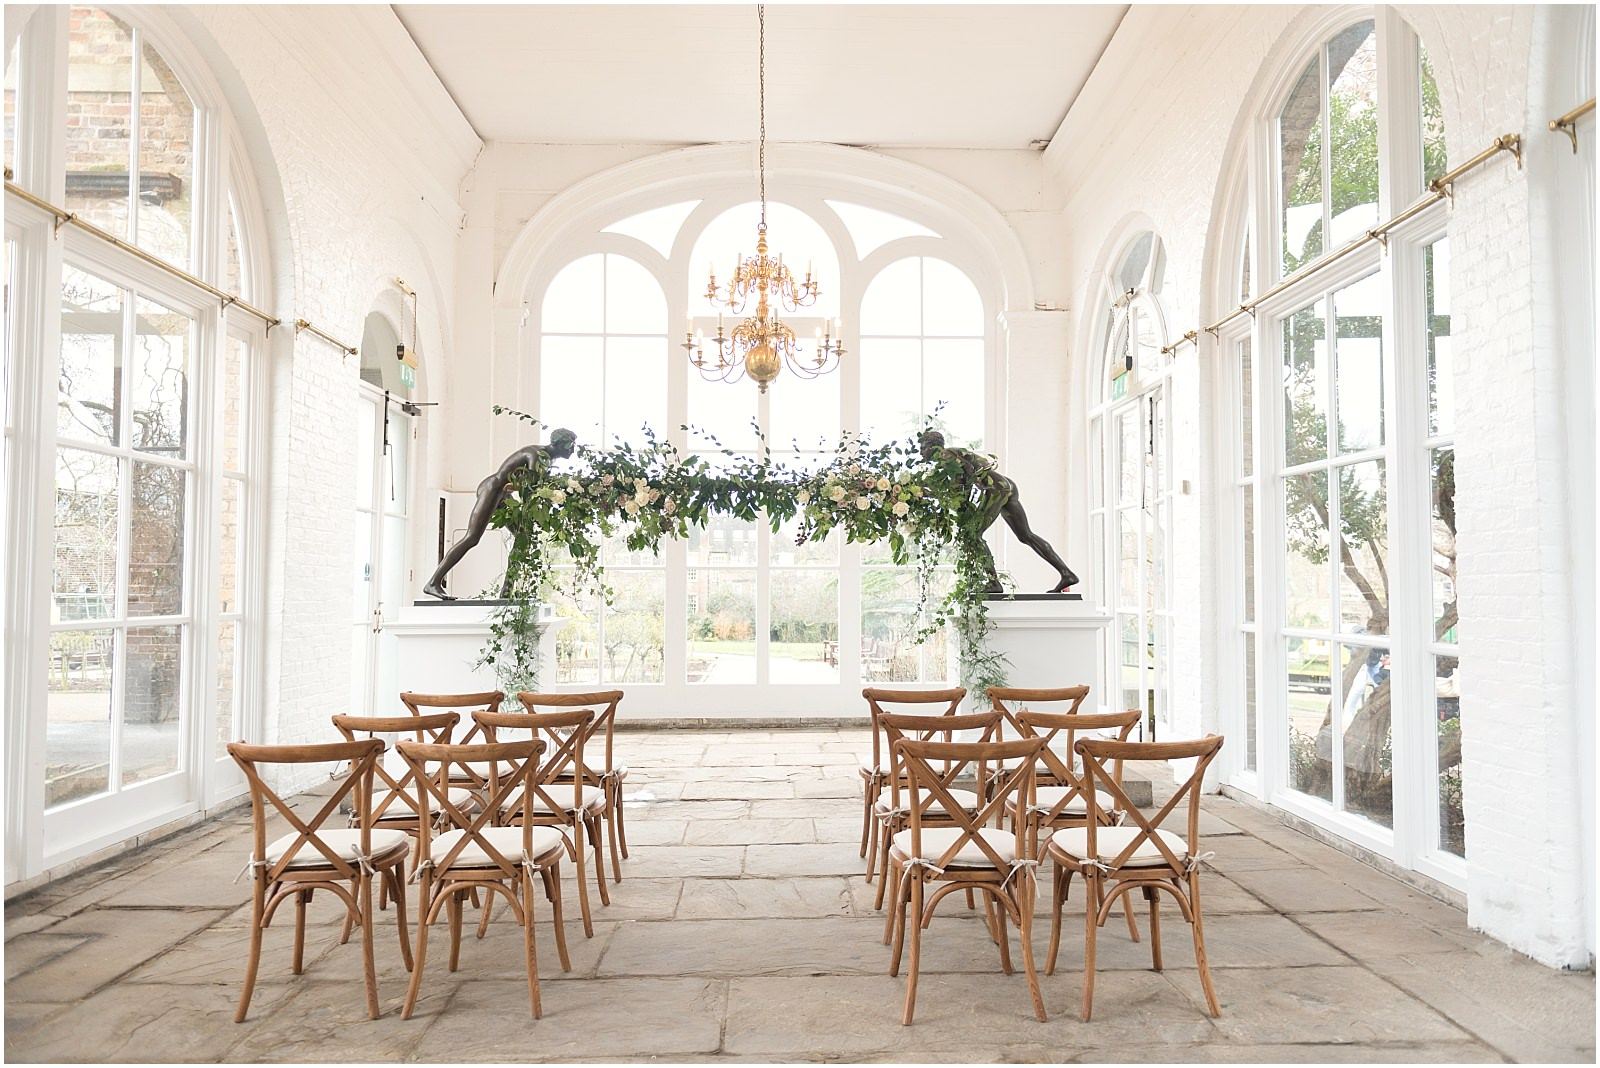 Orangery Holland Park London wedding venue